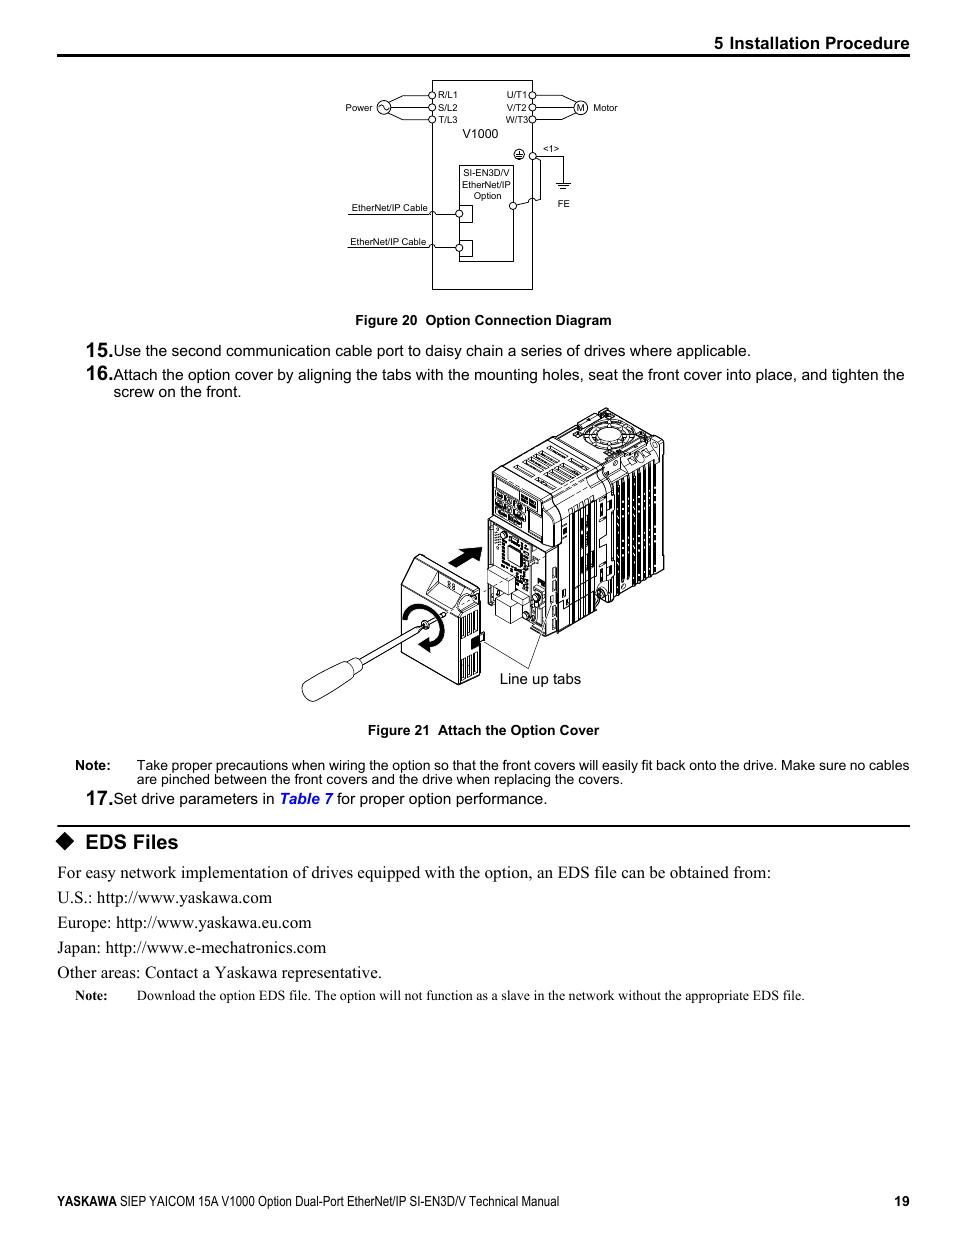 Eds files, 5 installation procedure   Yaskawa V1000 Option Dual Port EtherNet/IP SI-EN3D/V Technical Manual User Manual   Page 19 / 68